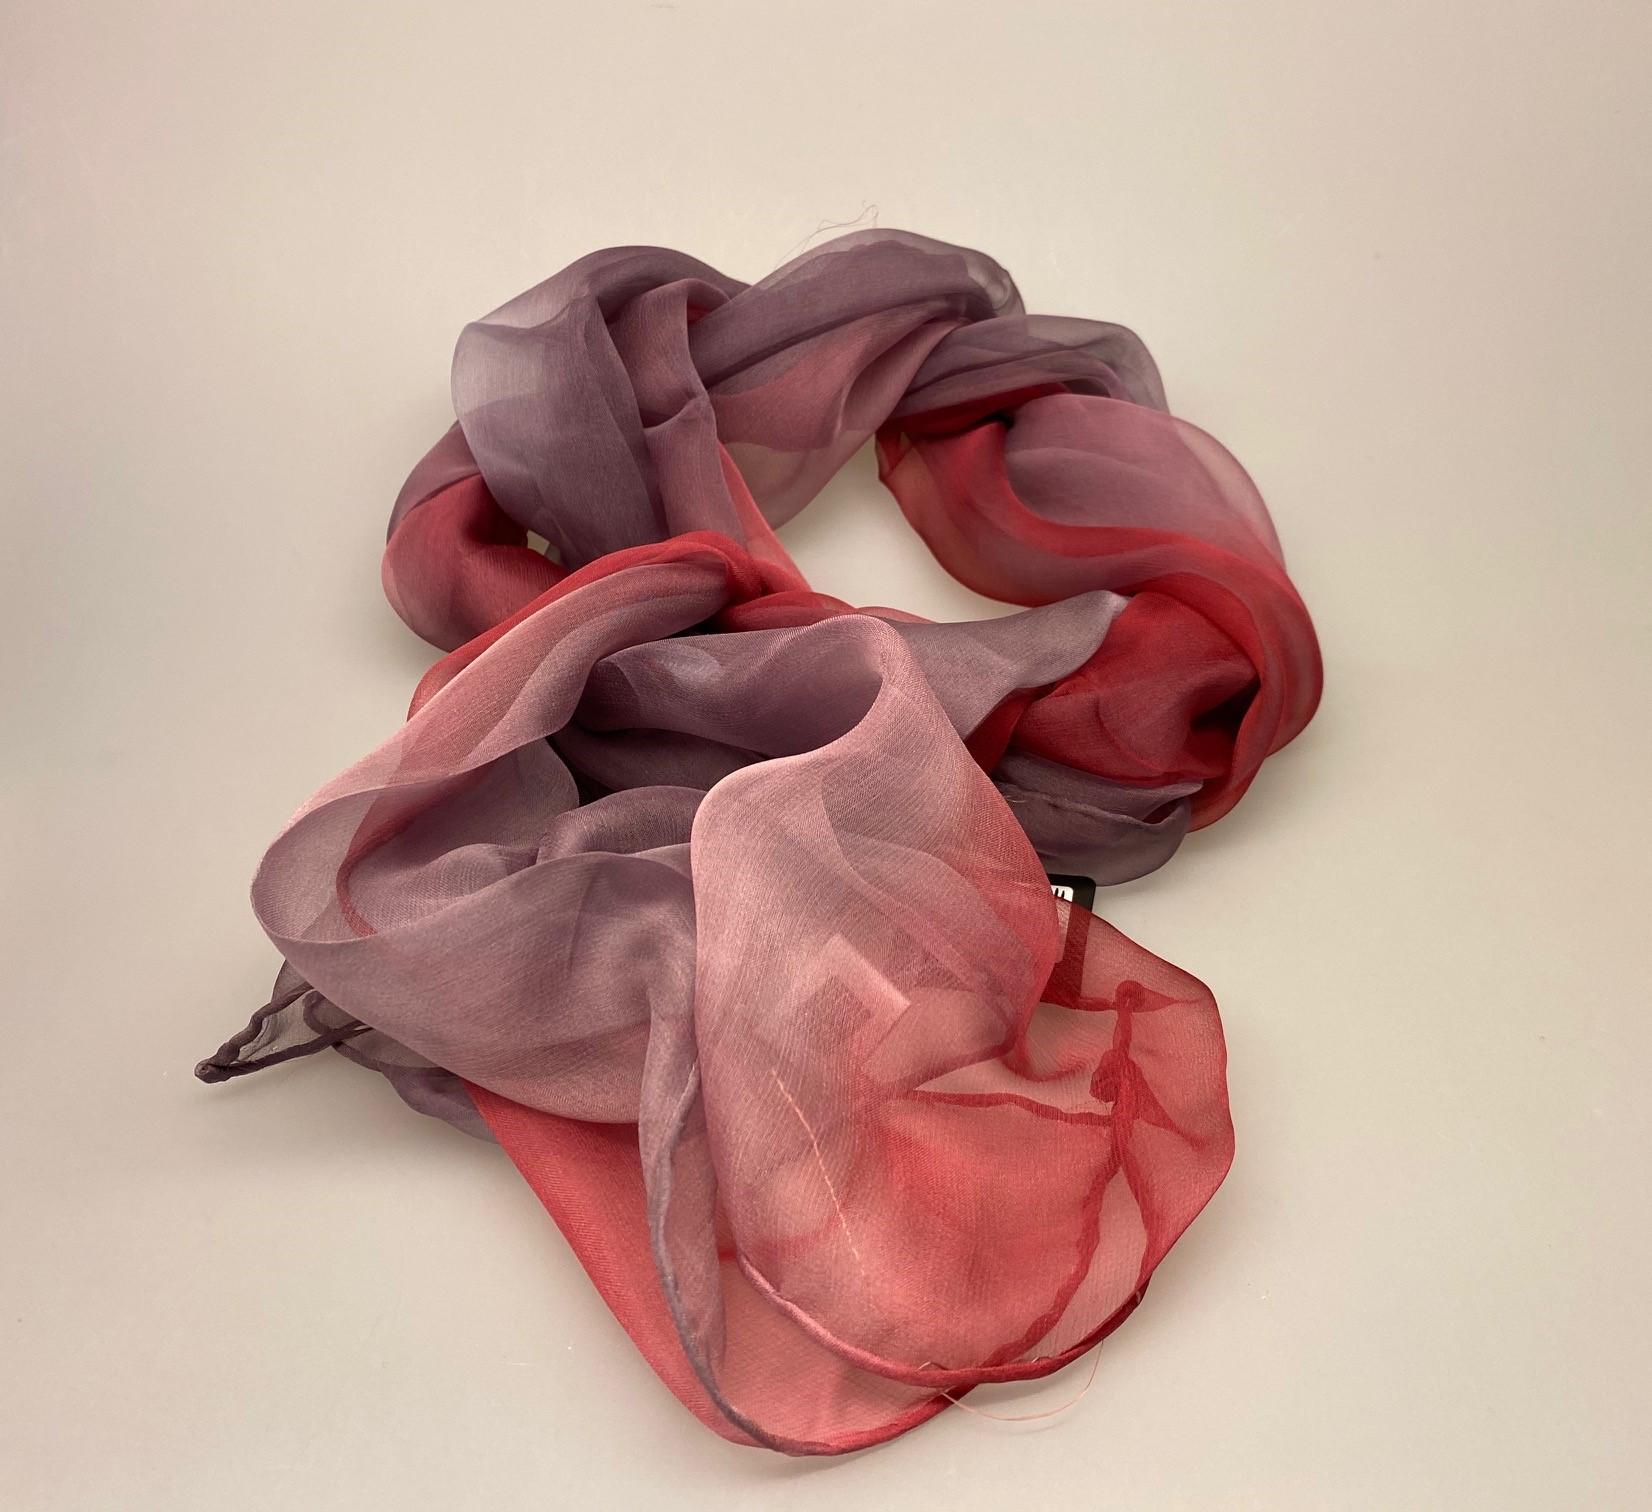 1158-250, Silkechiffon Tørklæde 1158 - Lyng/Lilla ,silke, hvid, lyngfarvet, lilla, lynglilla, rosa, silke, ren silke, silketørklæde, silkechiffon, let, stort, volumen, sjal, stola, fest, festtøj, elegant, kvalitet, flot, kor, gave, gaveide, rund fødselsdag, biti, ribe